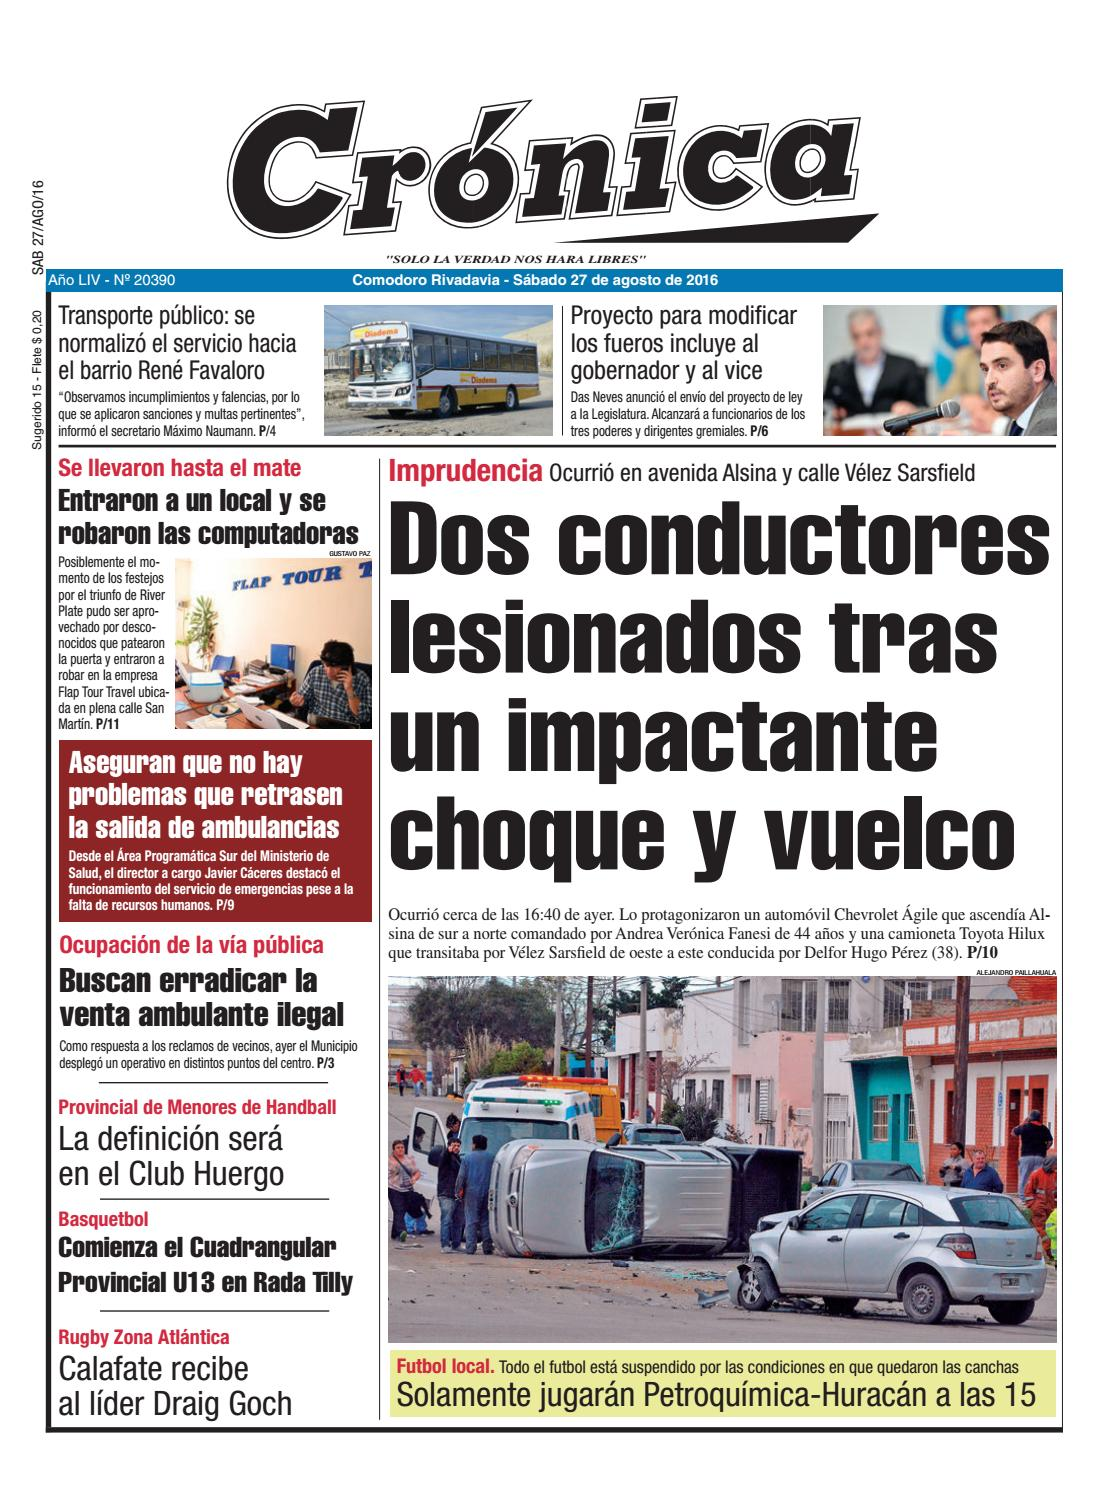 a258da6b 249264e906ee2f1c1cb573060b19f53f by Diario Crónica - issuu